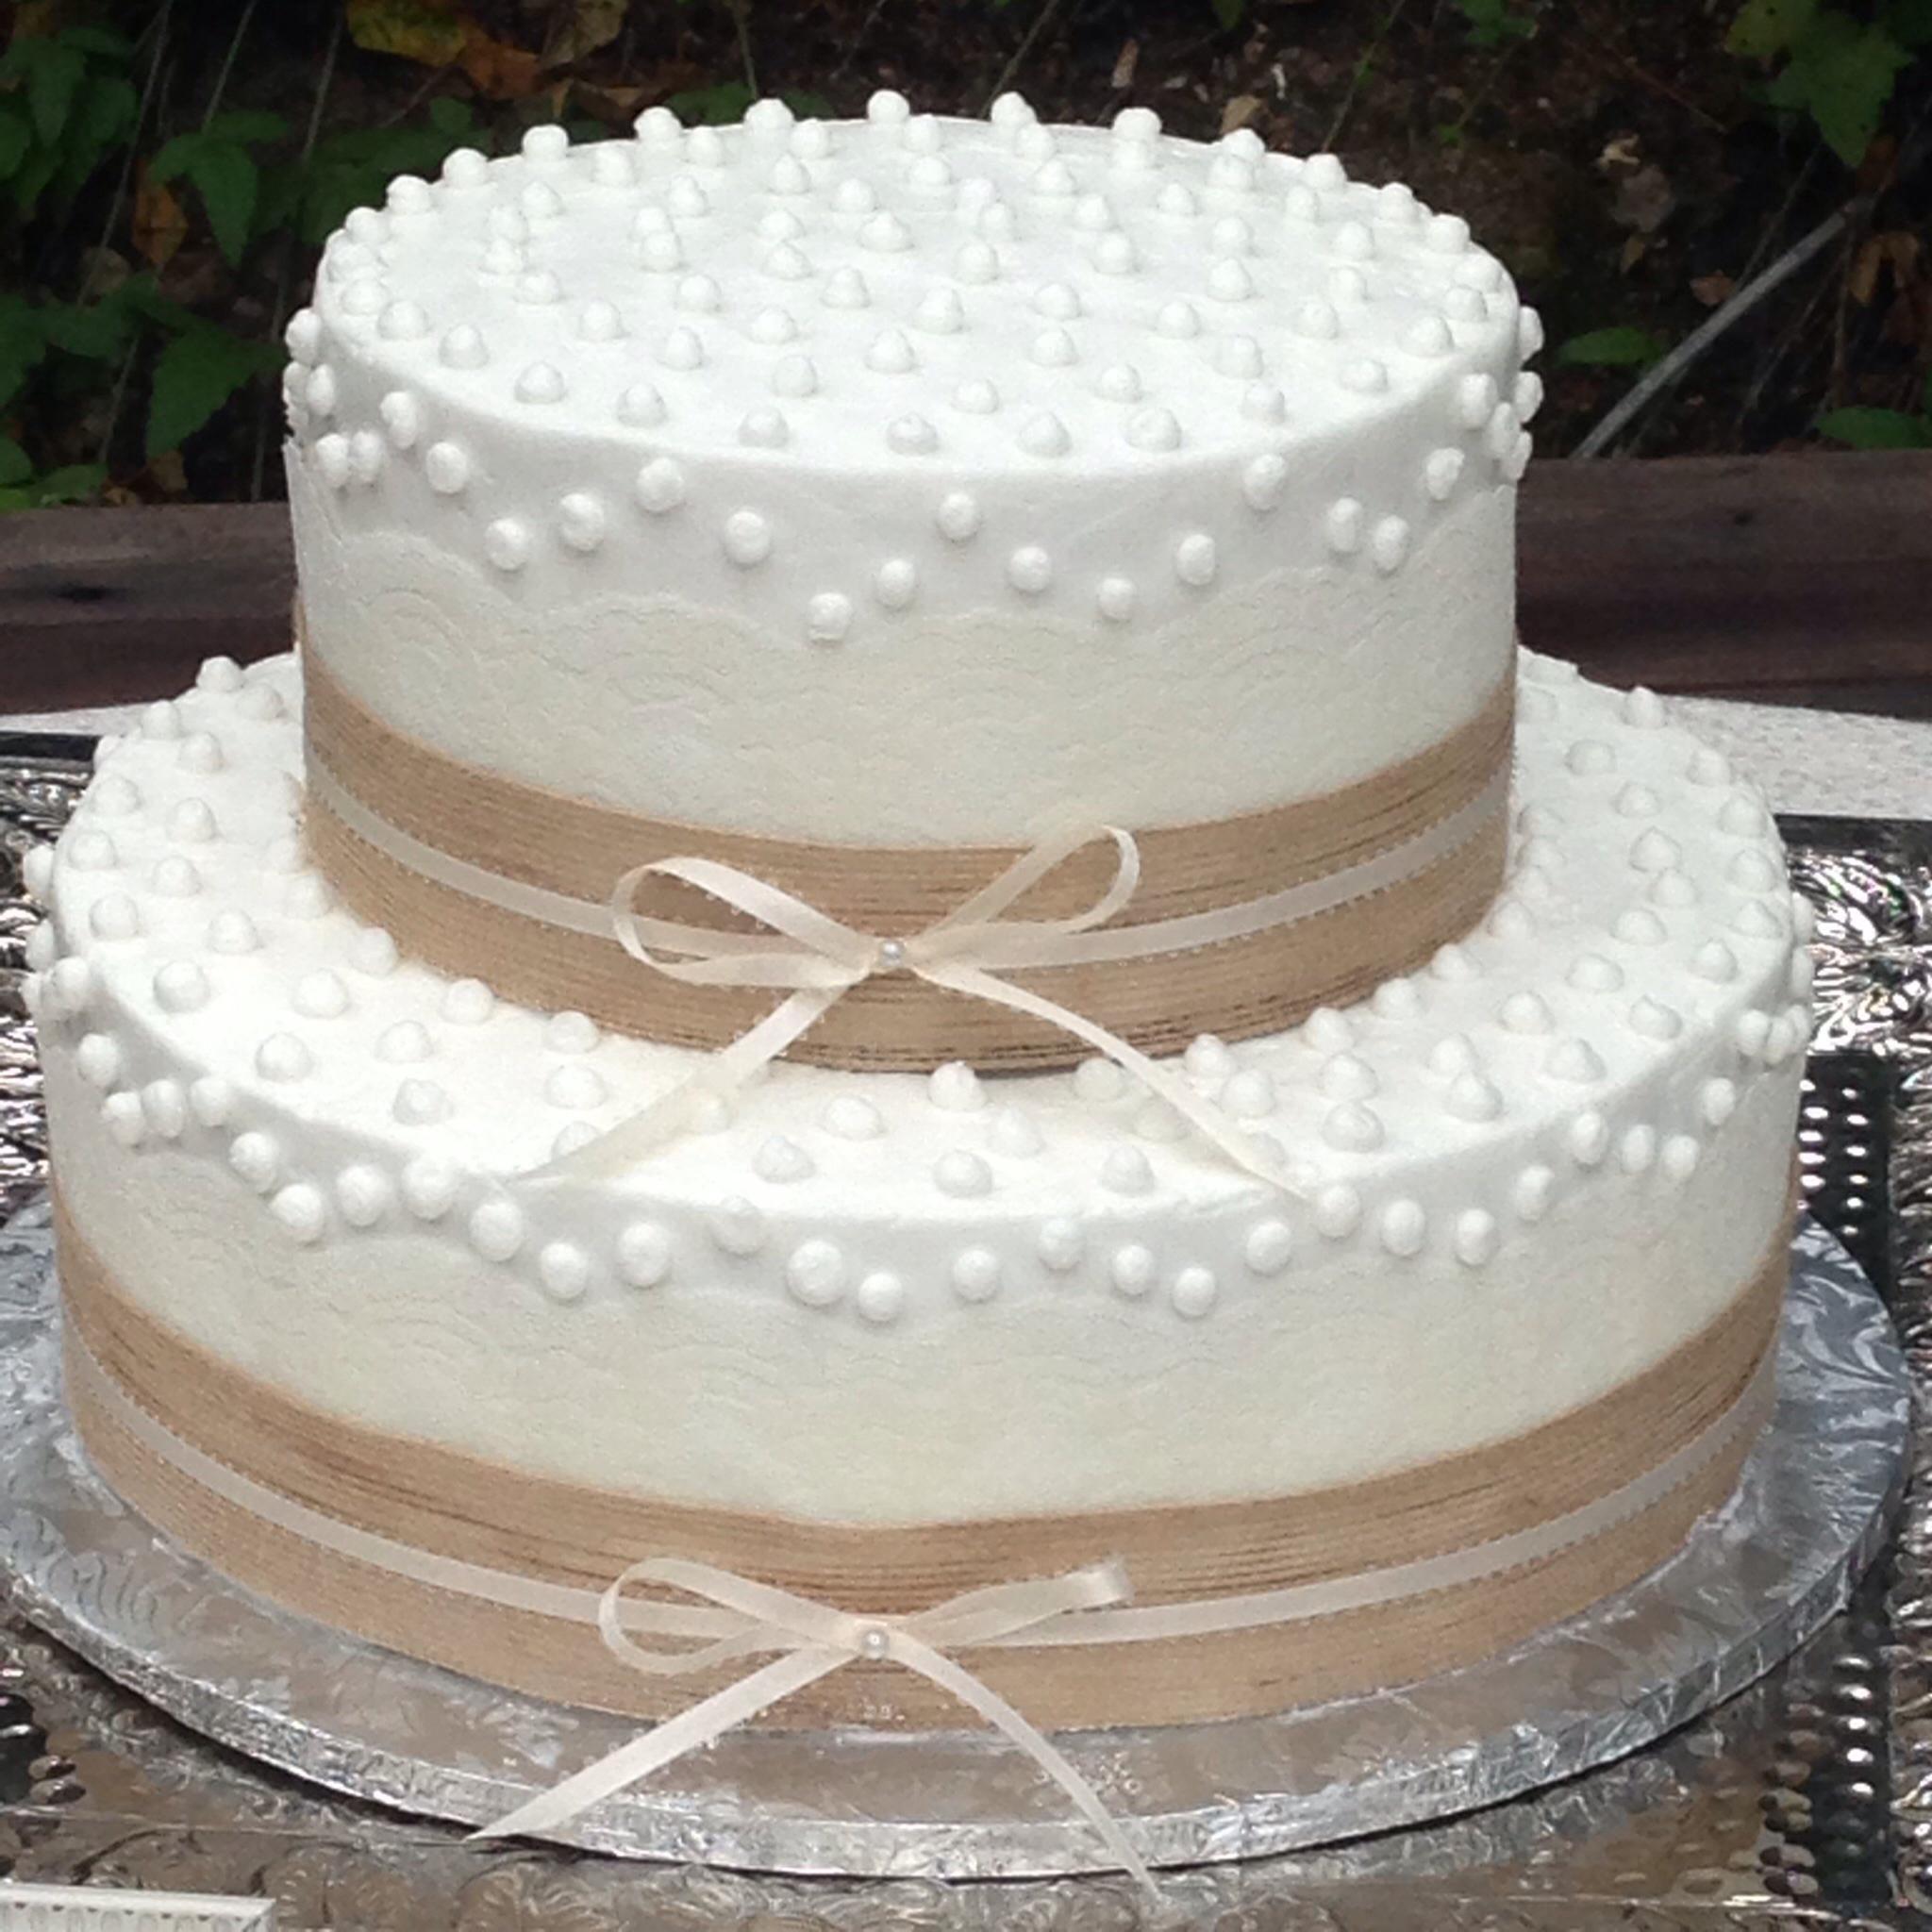 12 Buttercream Wedding Cakes And Ribbon Photo - Buttercream Wedding ...